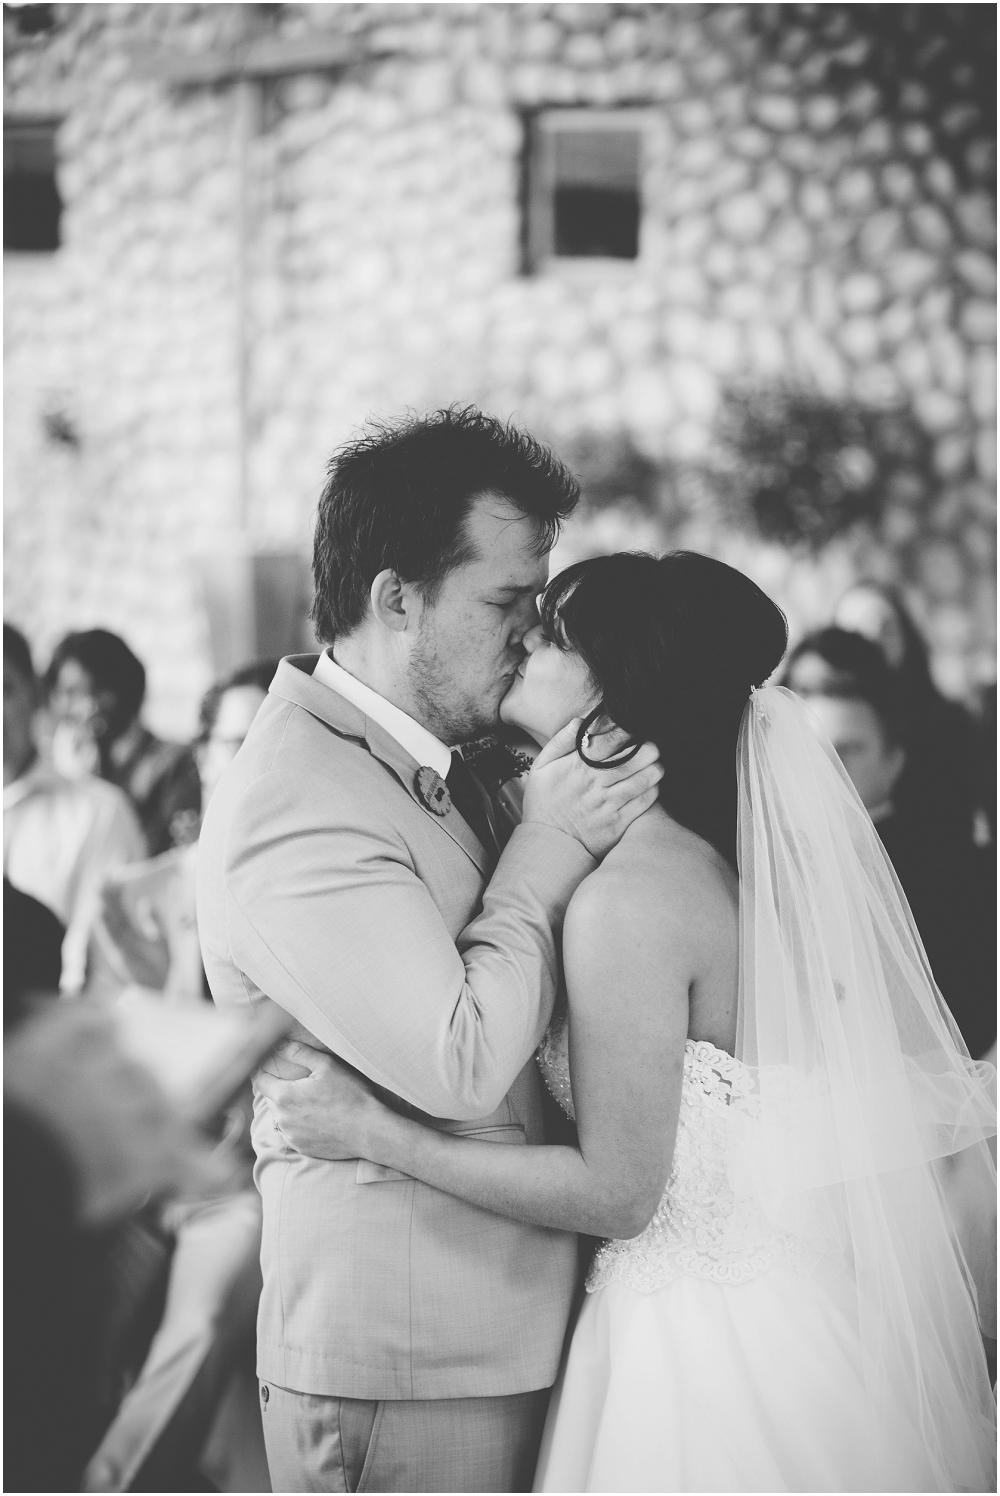 RonelKrugerPhotography_Kliplapa Wedding Photographer (47).jpg